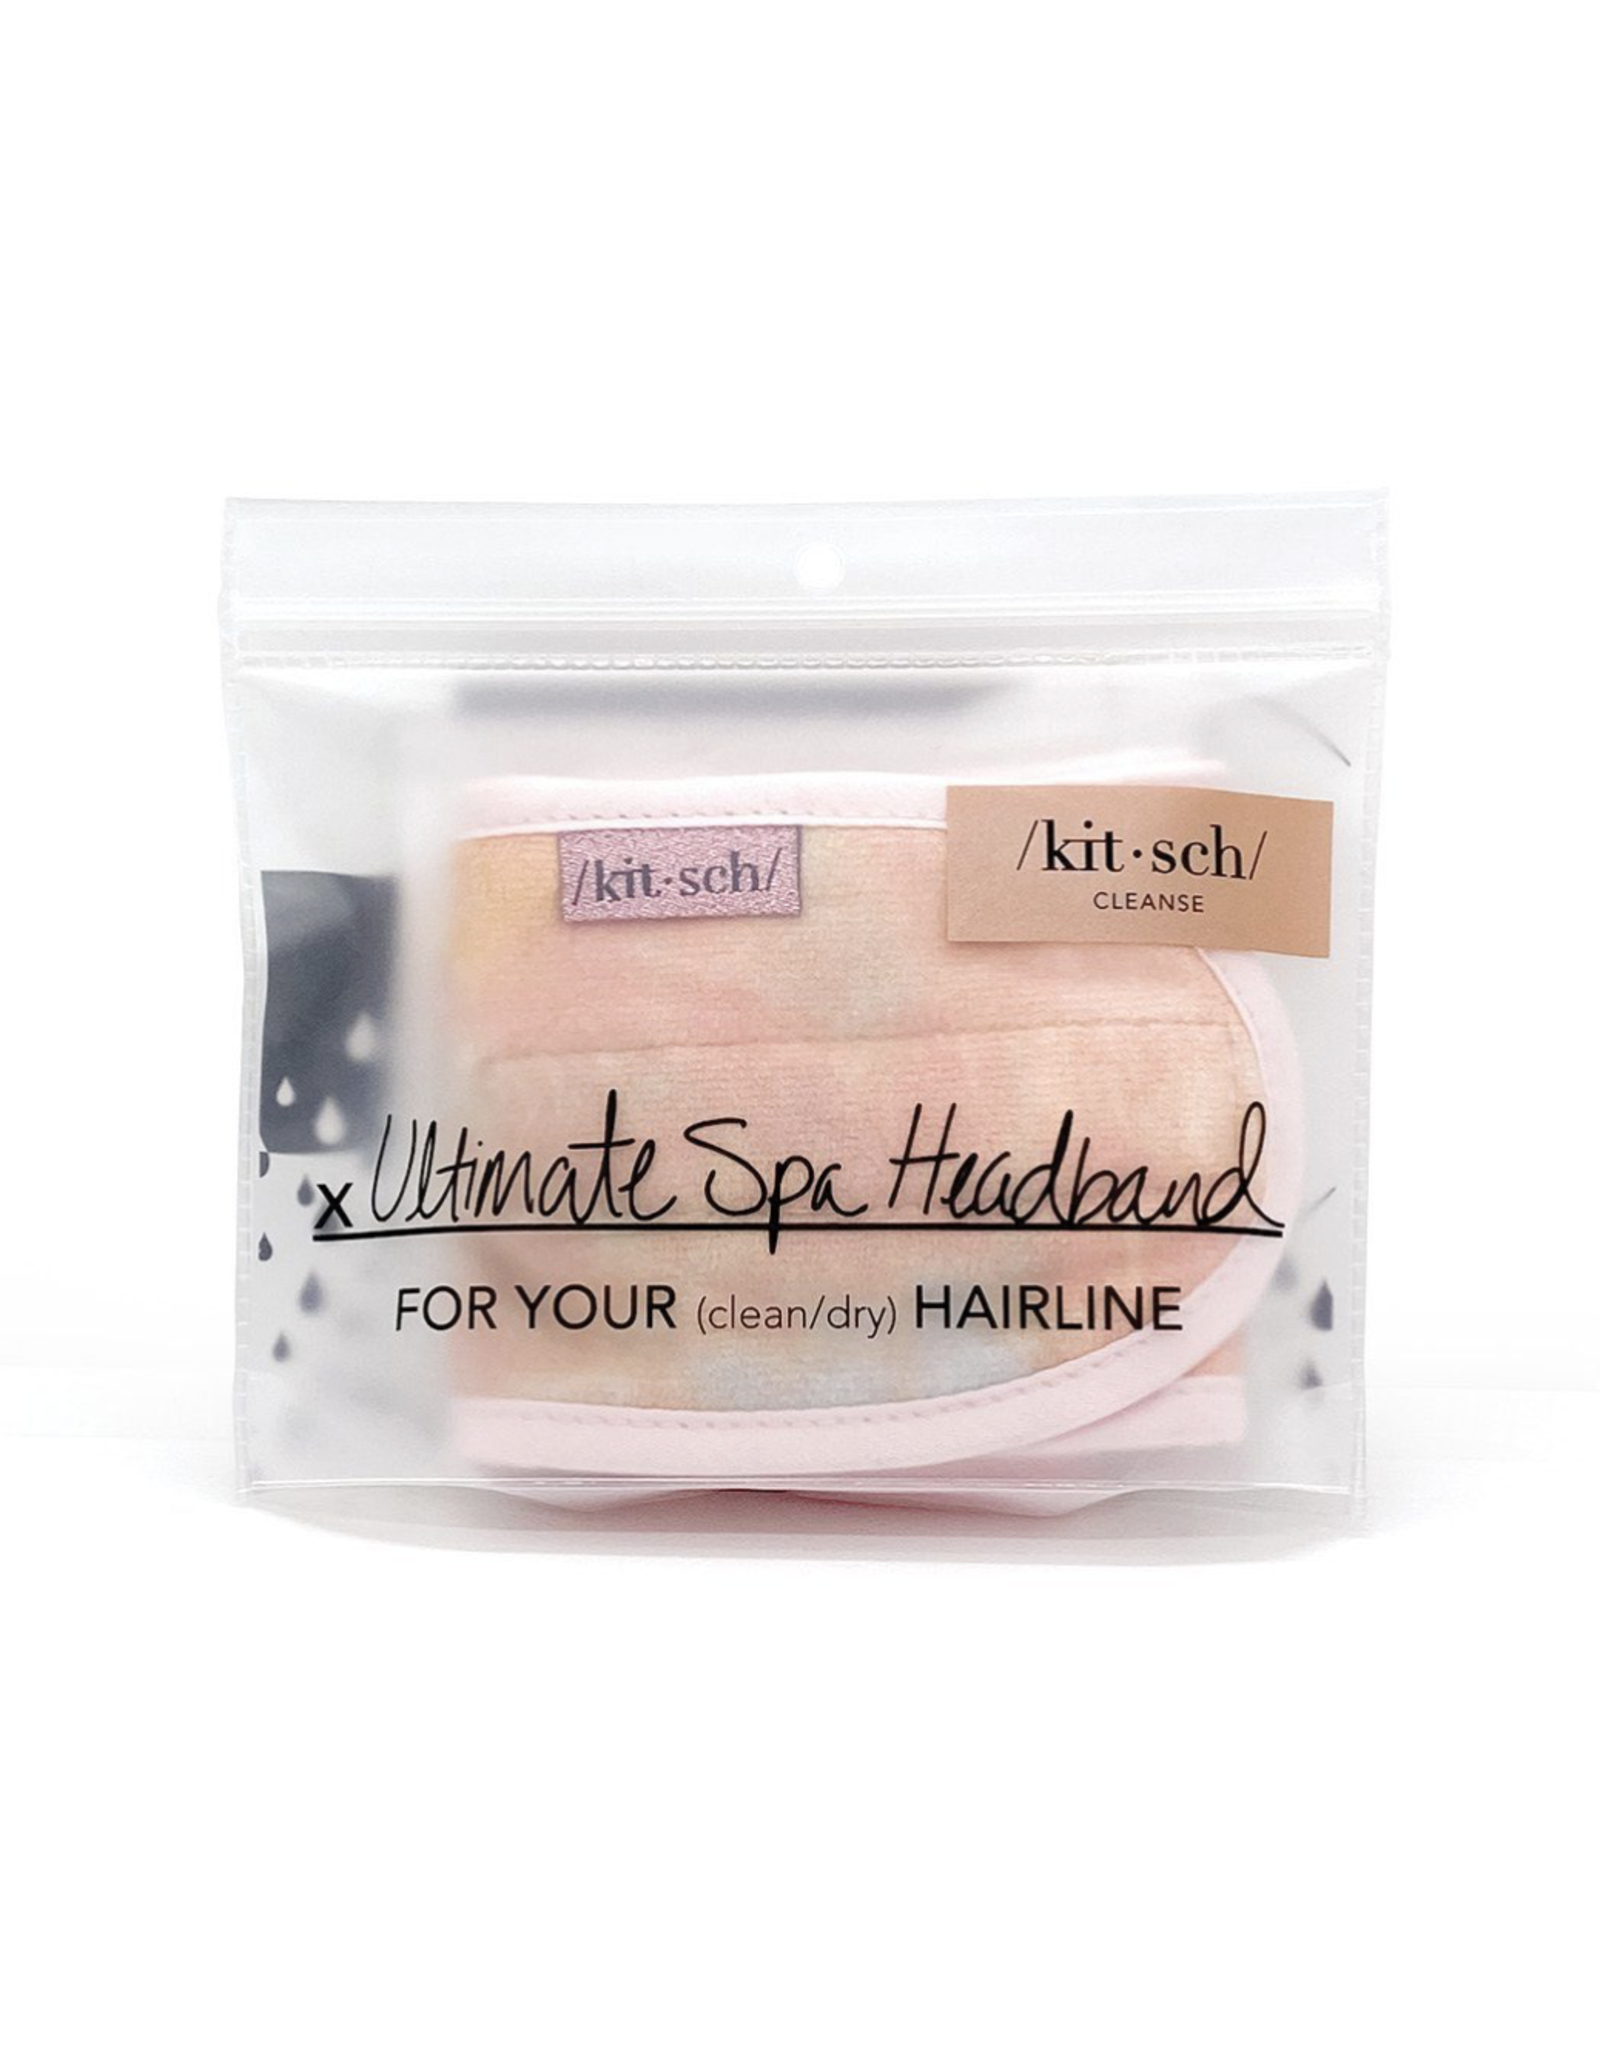 Kitsch Microfiber Spa Headband Sunset Tie Dye